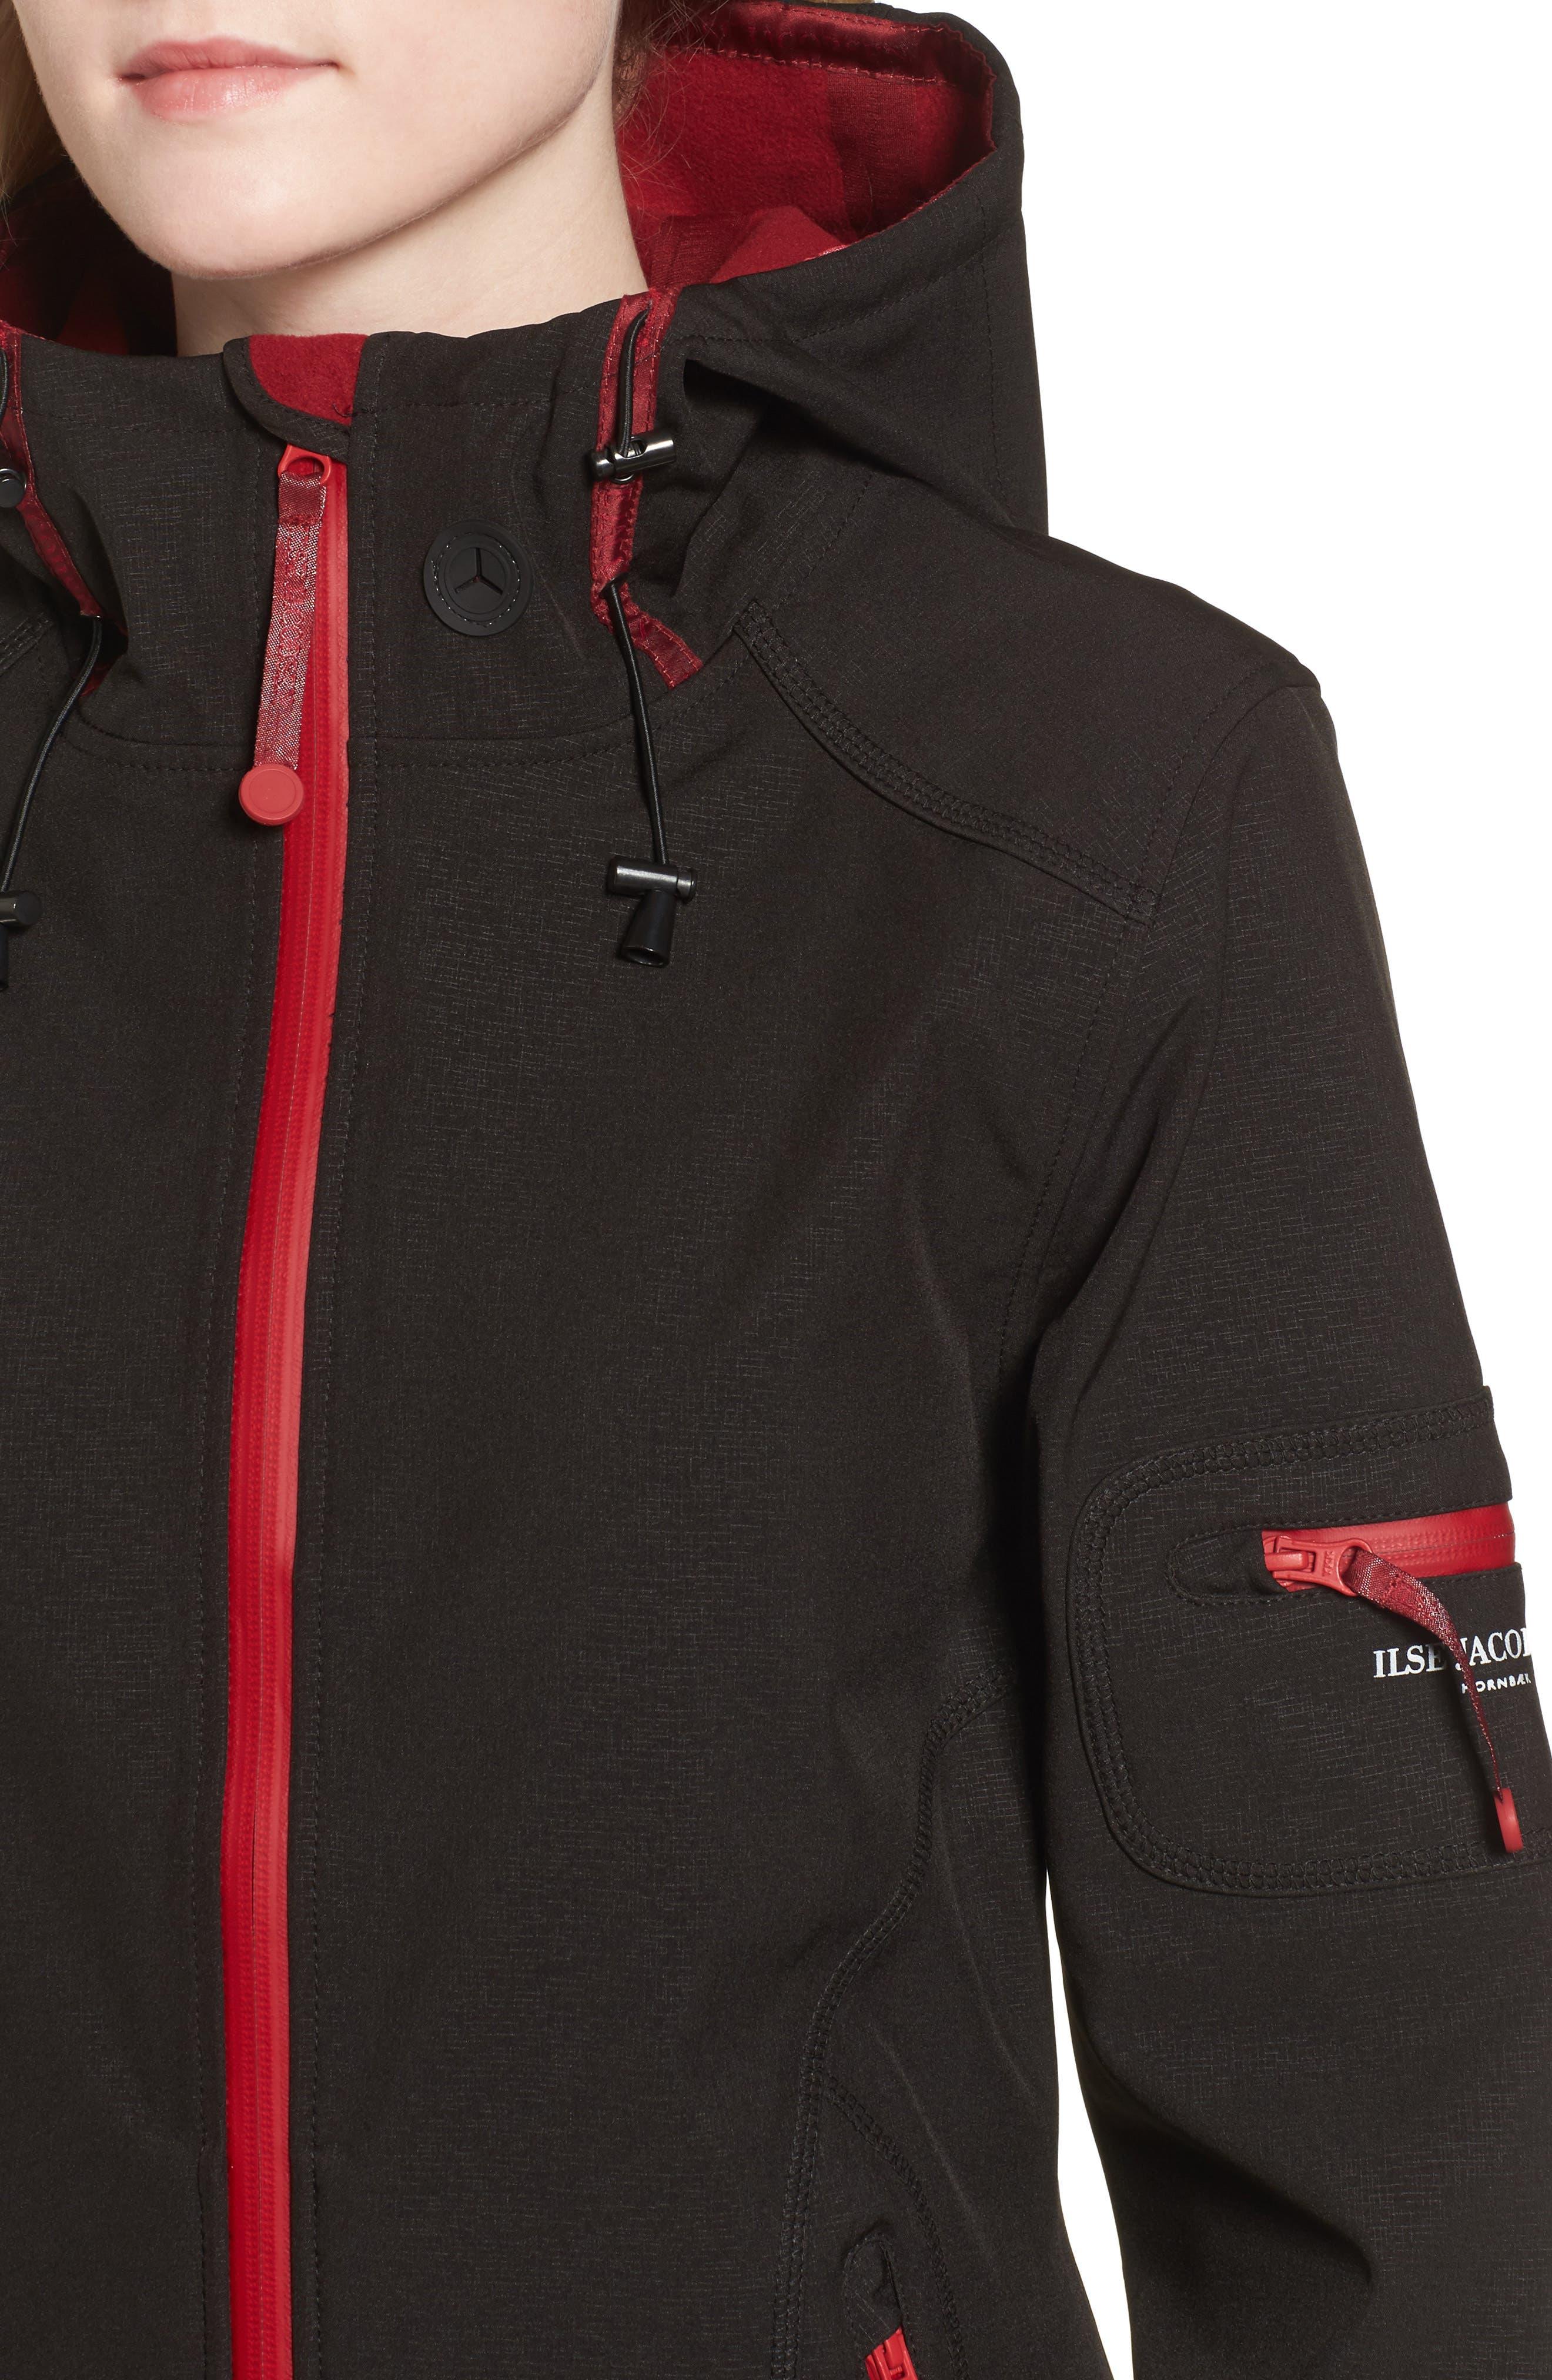 'Rain 7B' Hooded Water Resistant Coat,                             Alternate thumbnail 5, color,                             Black/ Wine